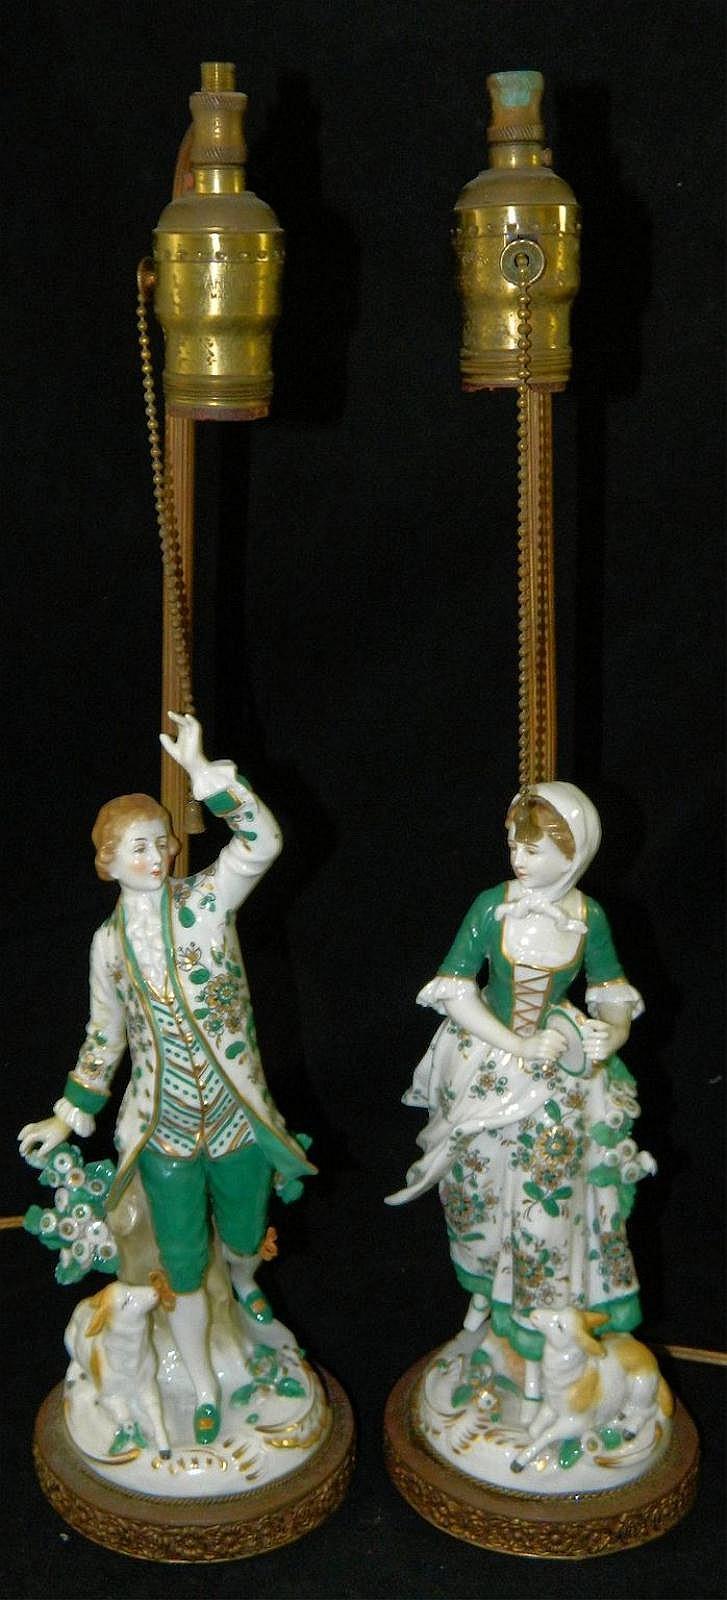 Pair of Figural Lamp Bases